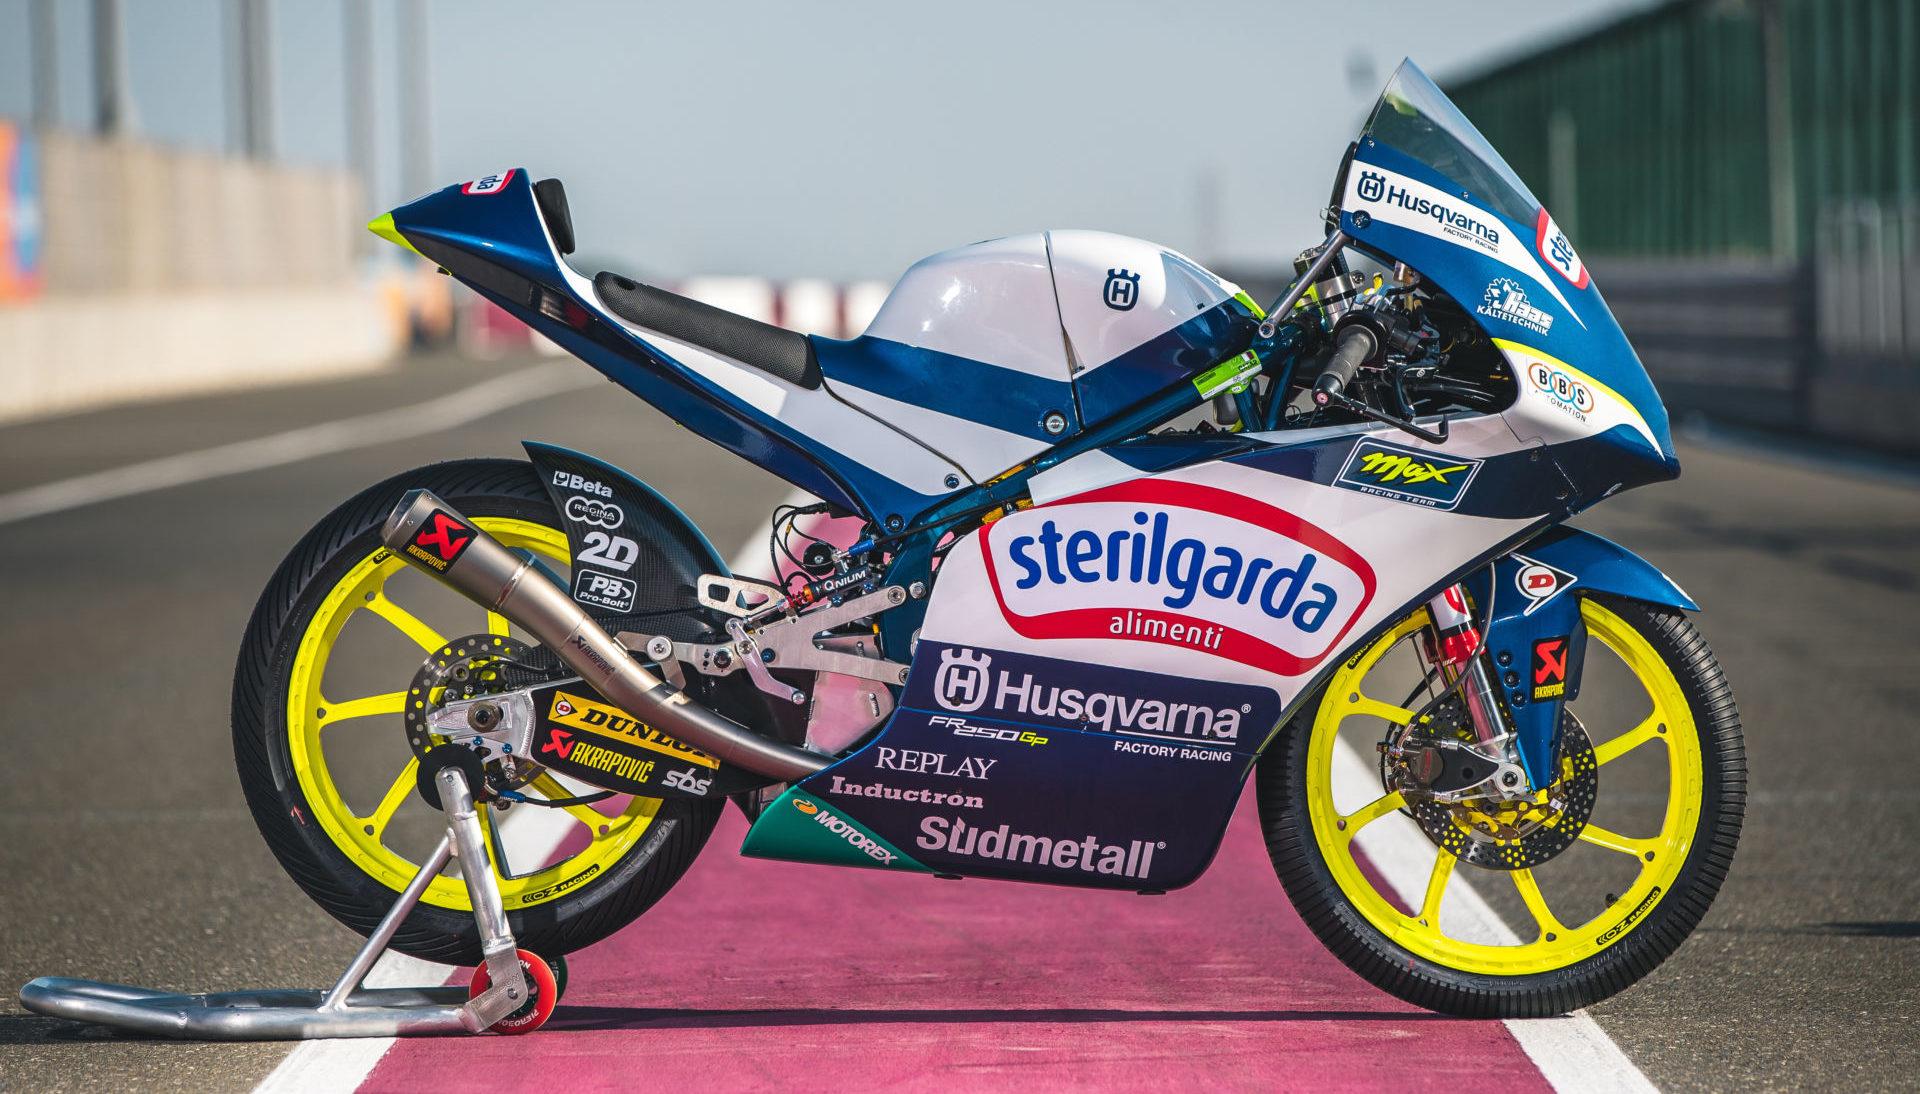 A 2020 Husqvarna Motorcycles FR 250 GP racebike. Photo courtesy Husqvarna.